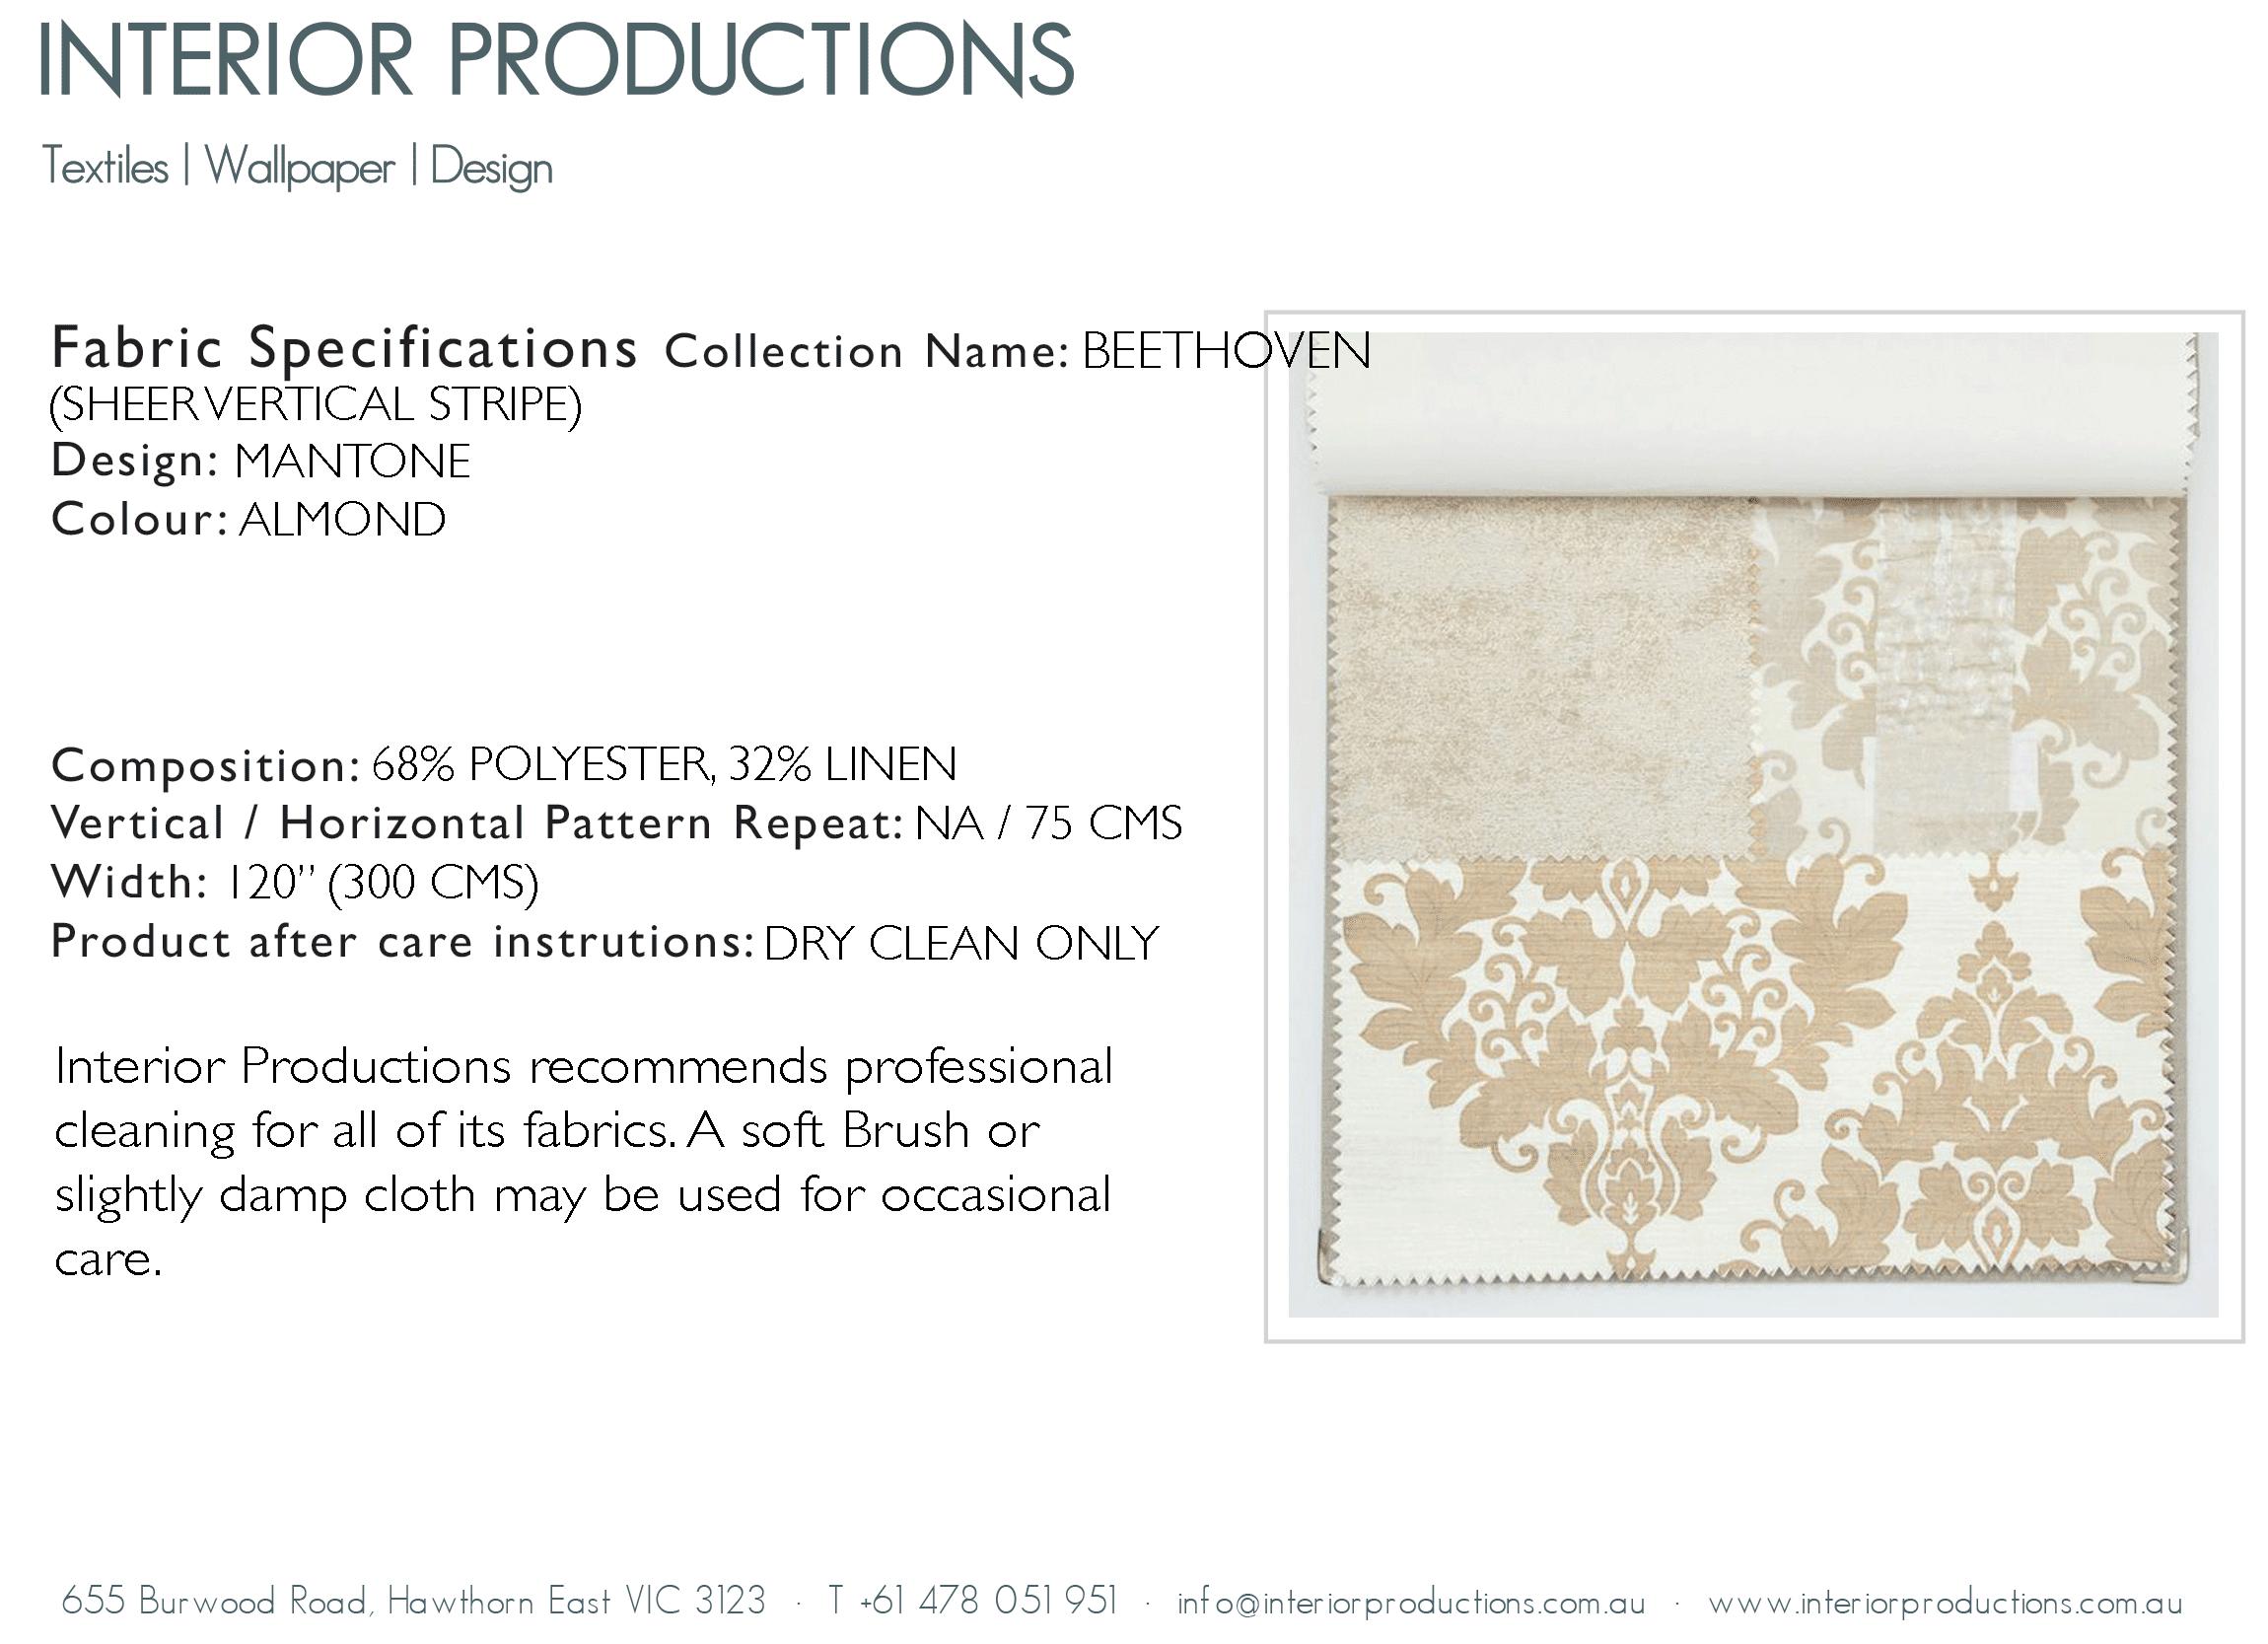 interior_productions_MANTONE---ALMOND